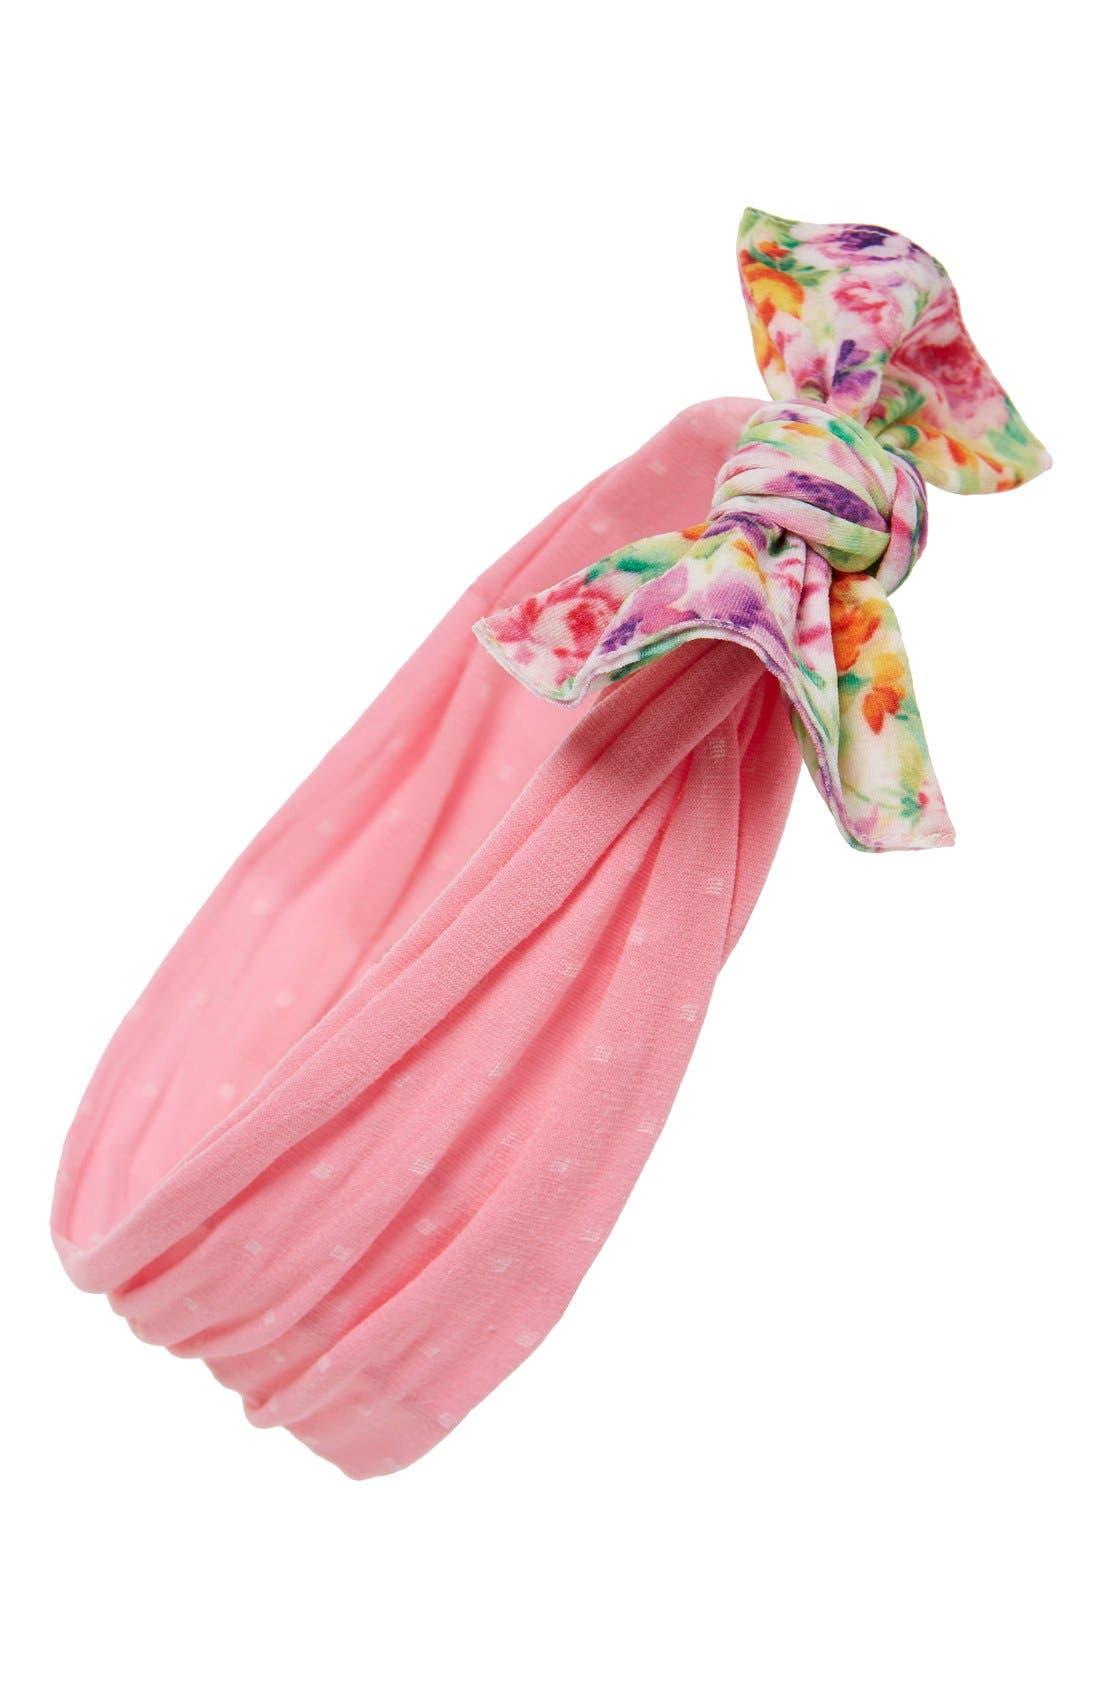 Print Bow Headband,                         Main,                         color, Floral Pink